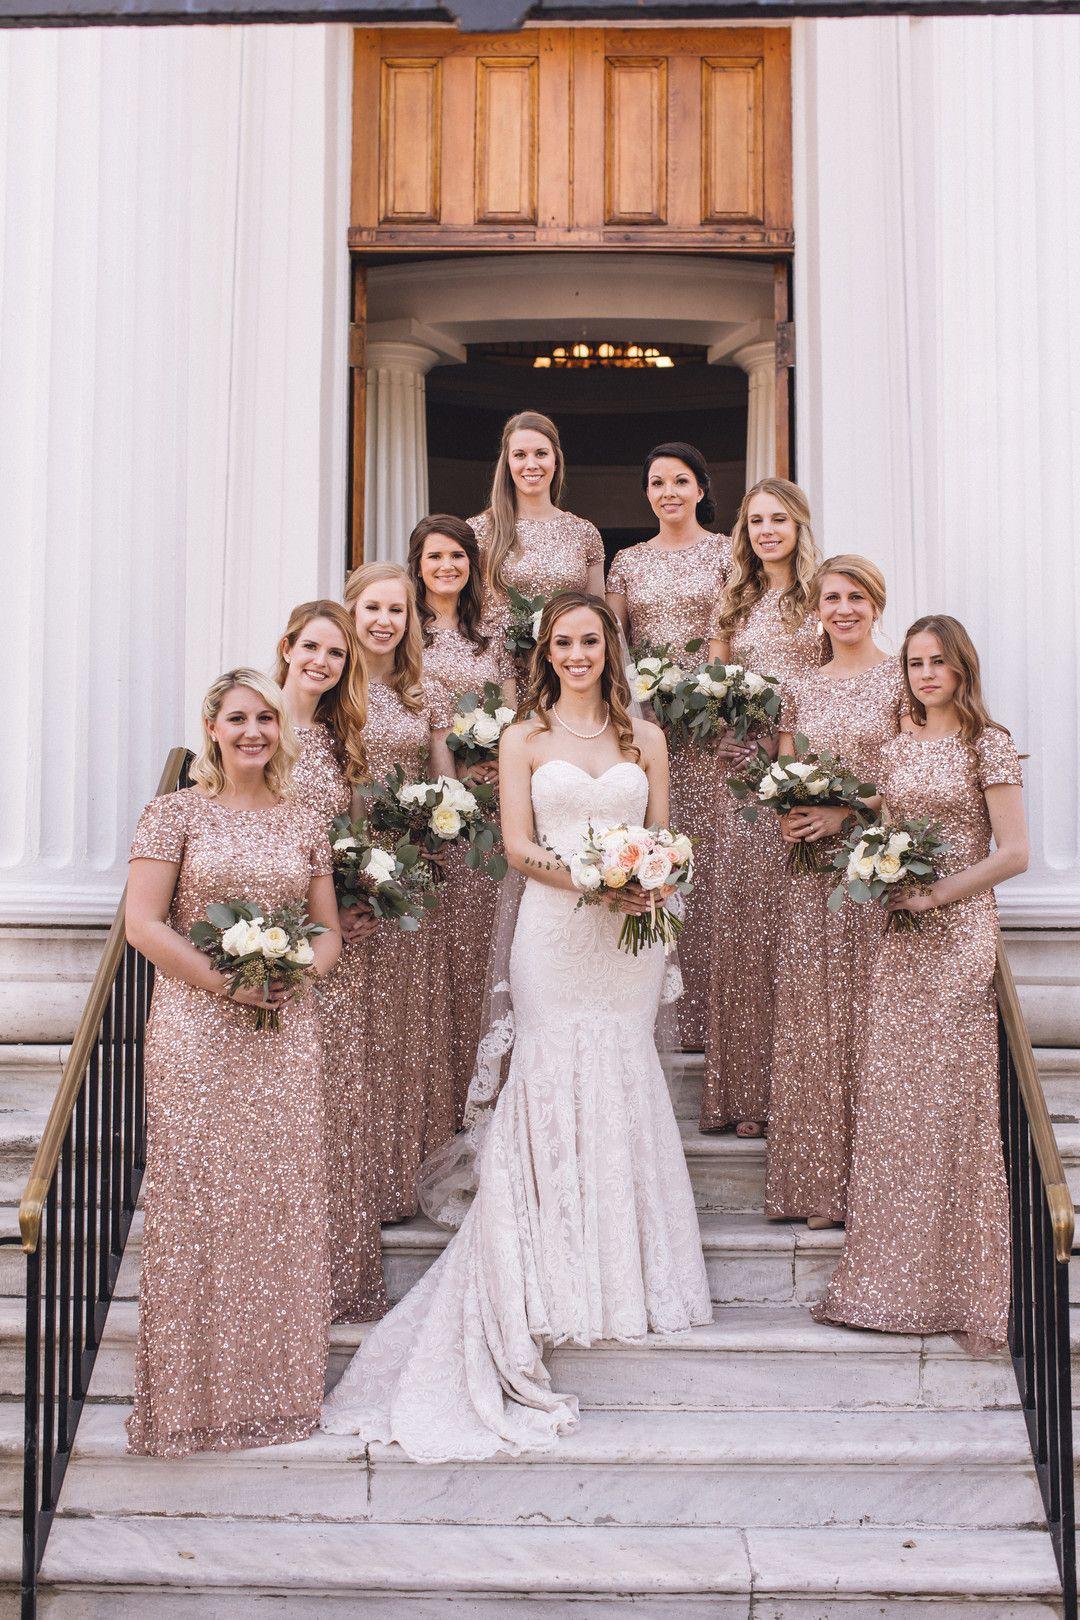 Wedding Vendors Rose Gold Bridesmaid Dress Wedding Bridesmaid Dresses Rose Gold Wedding Bridesmaids [ 1620 x 1080 Pixel ]